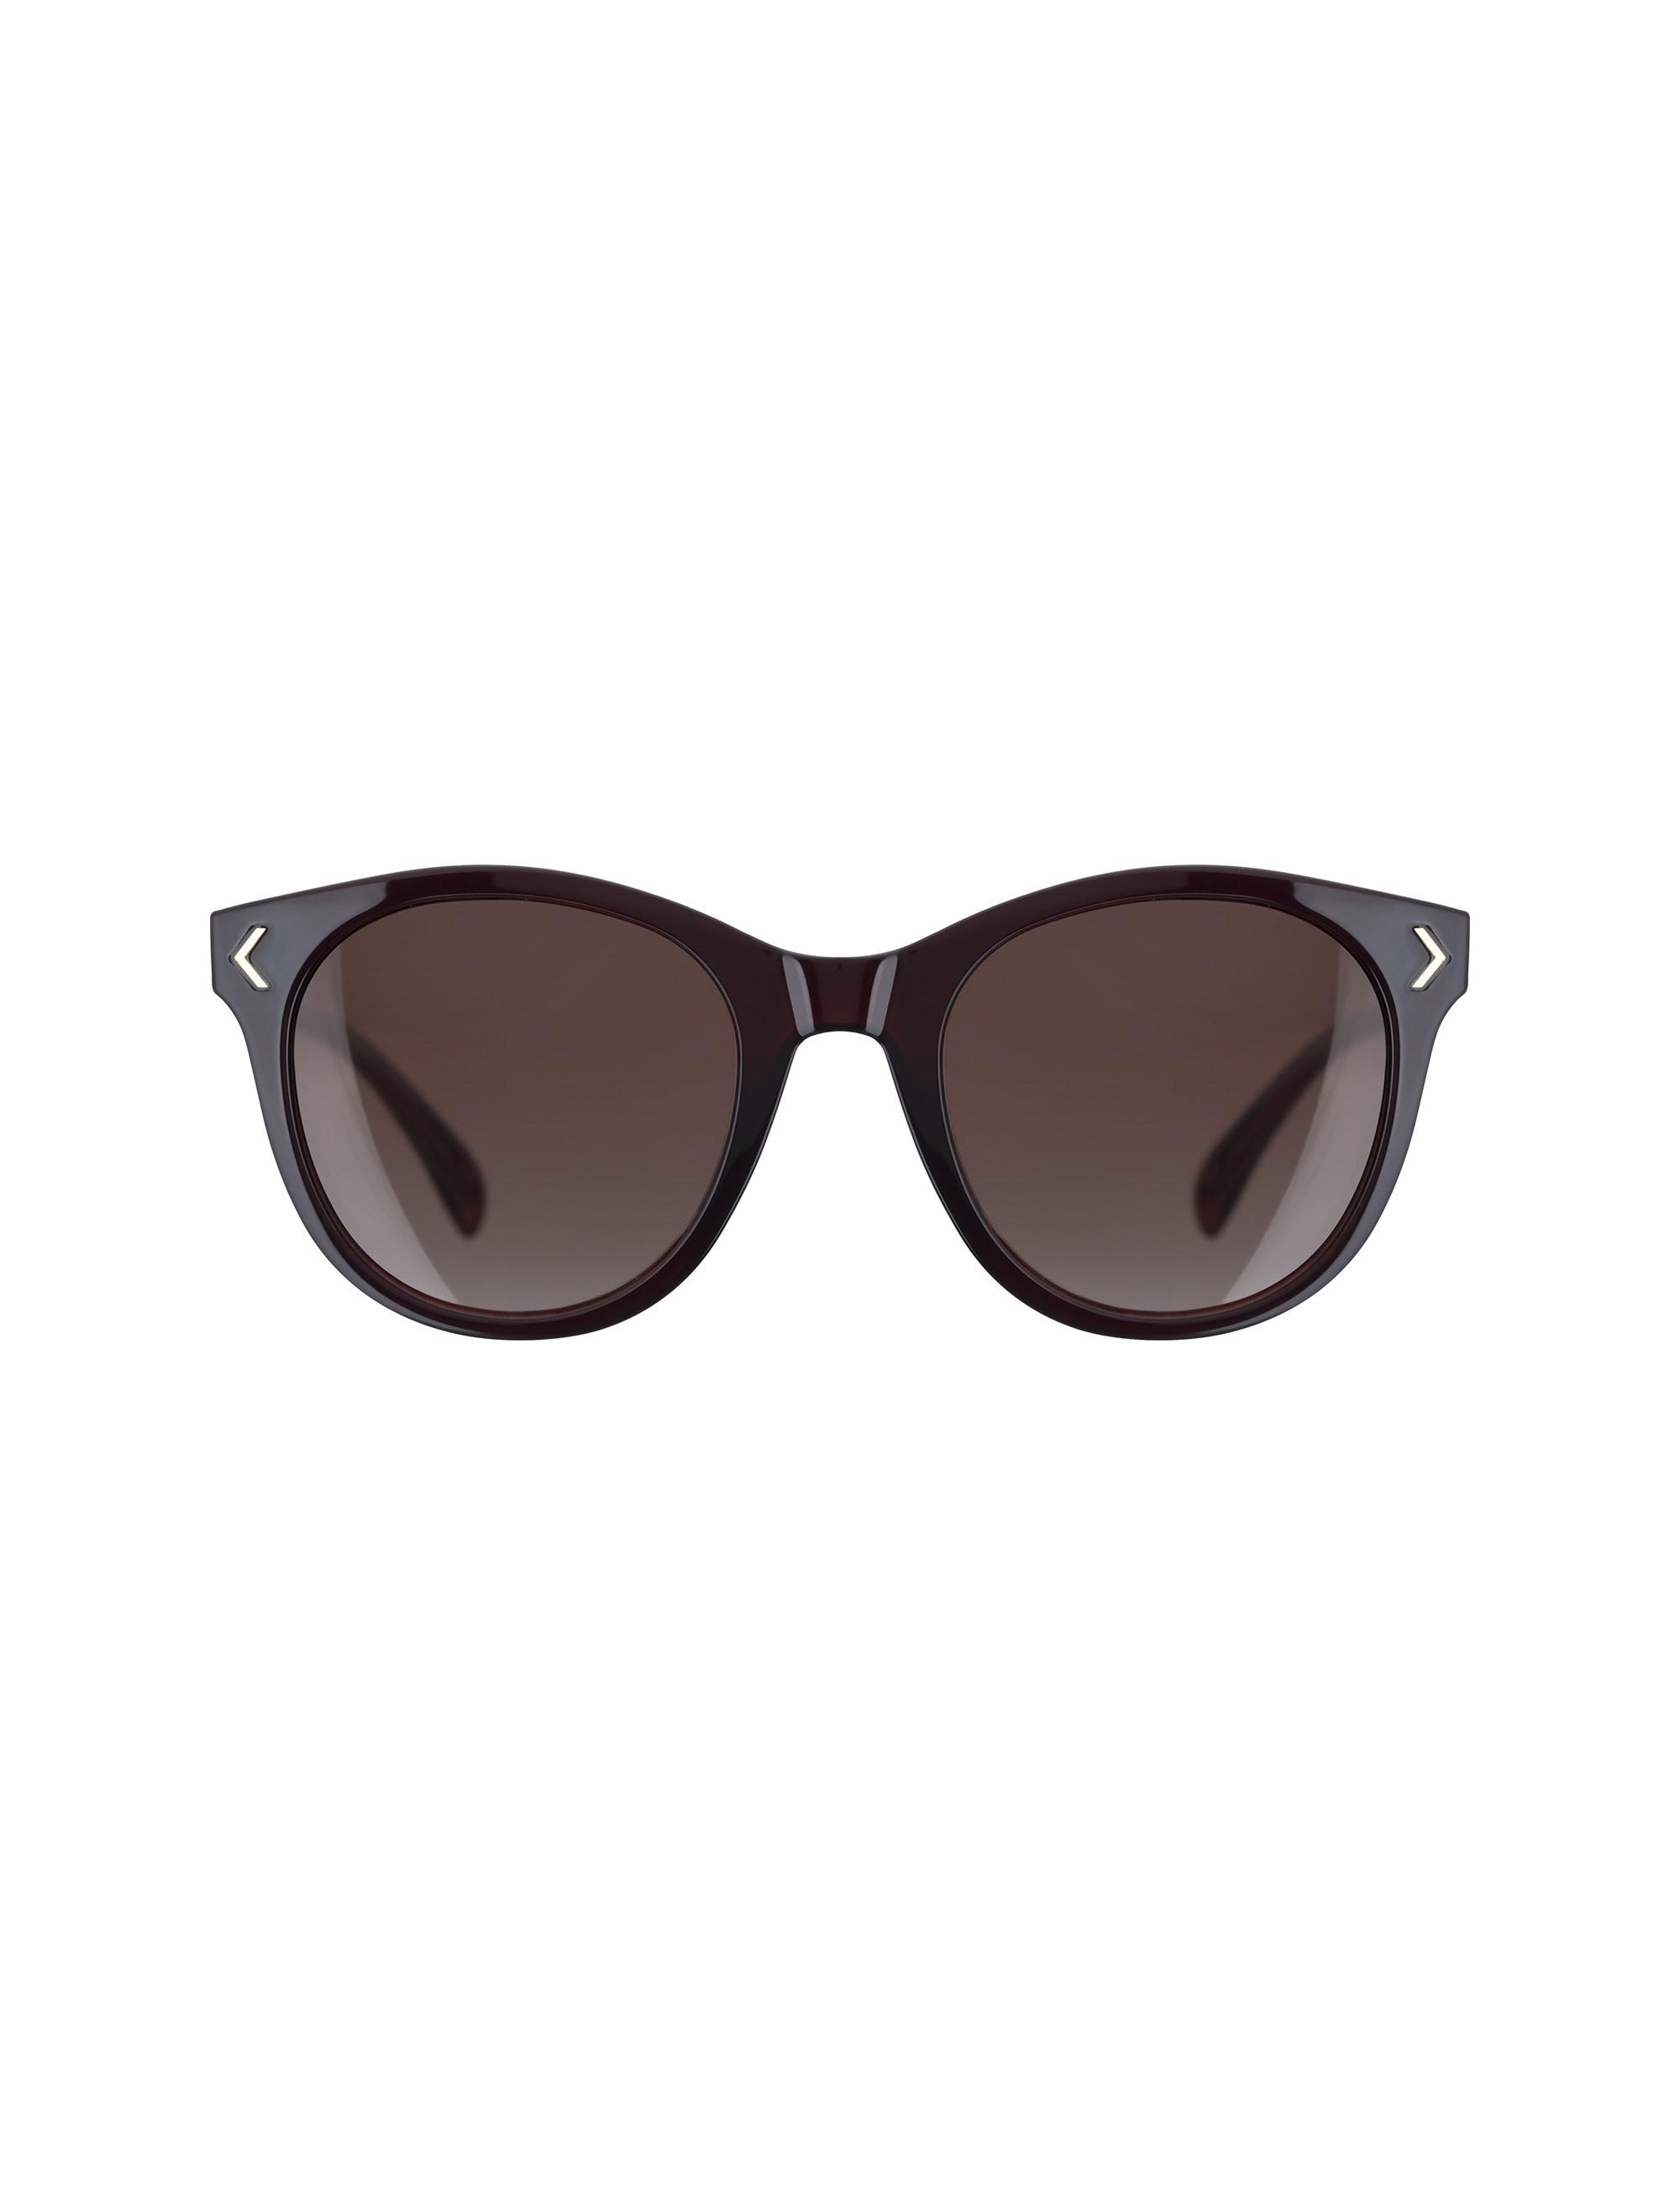 عینک آفتابی ویفرر زنانه - کارن میلن - قهوه اي - 2